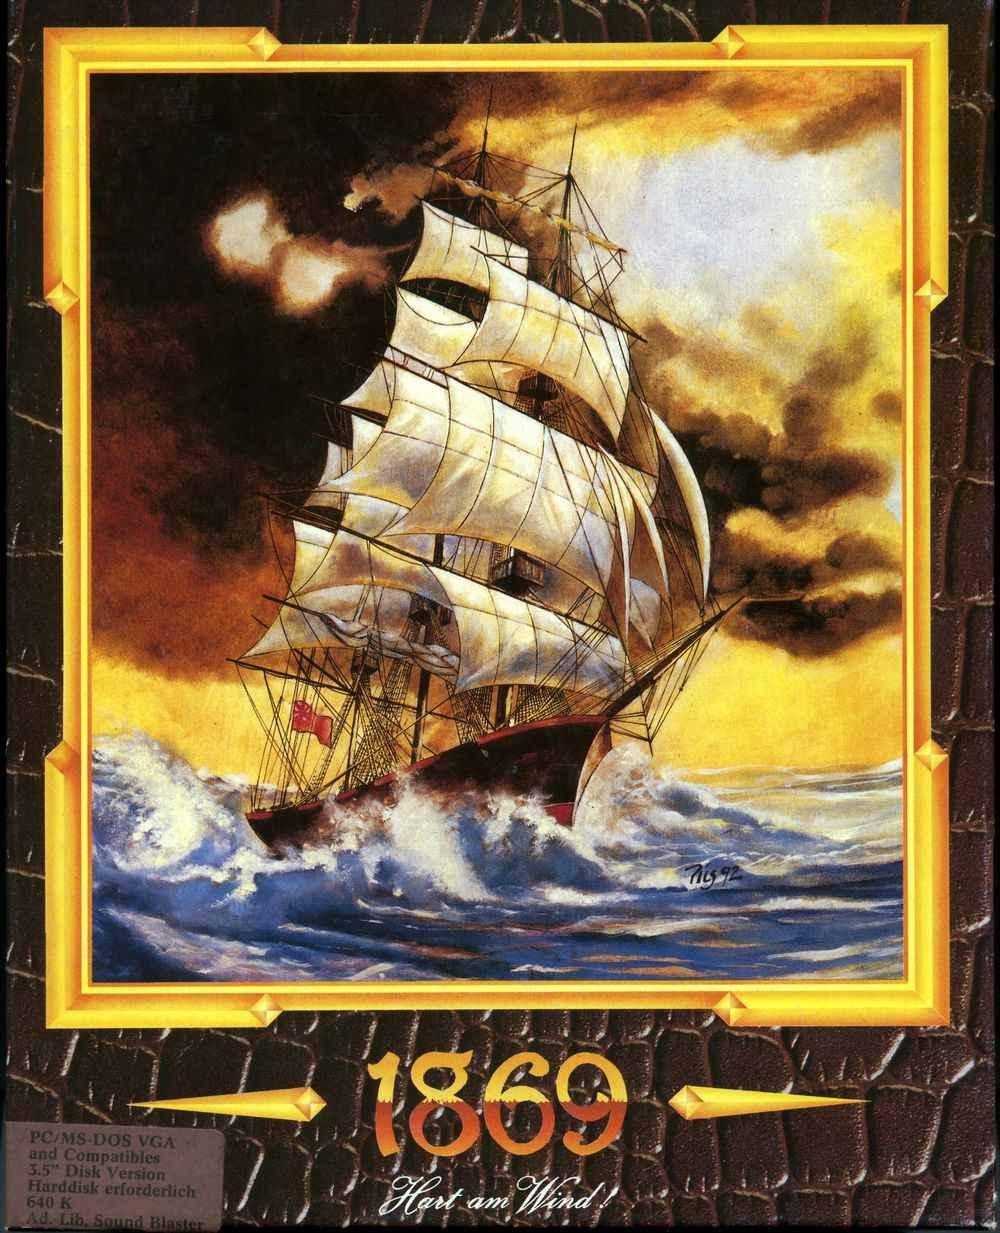 1869 (AGA) Disk3